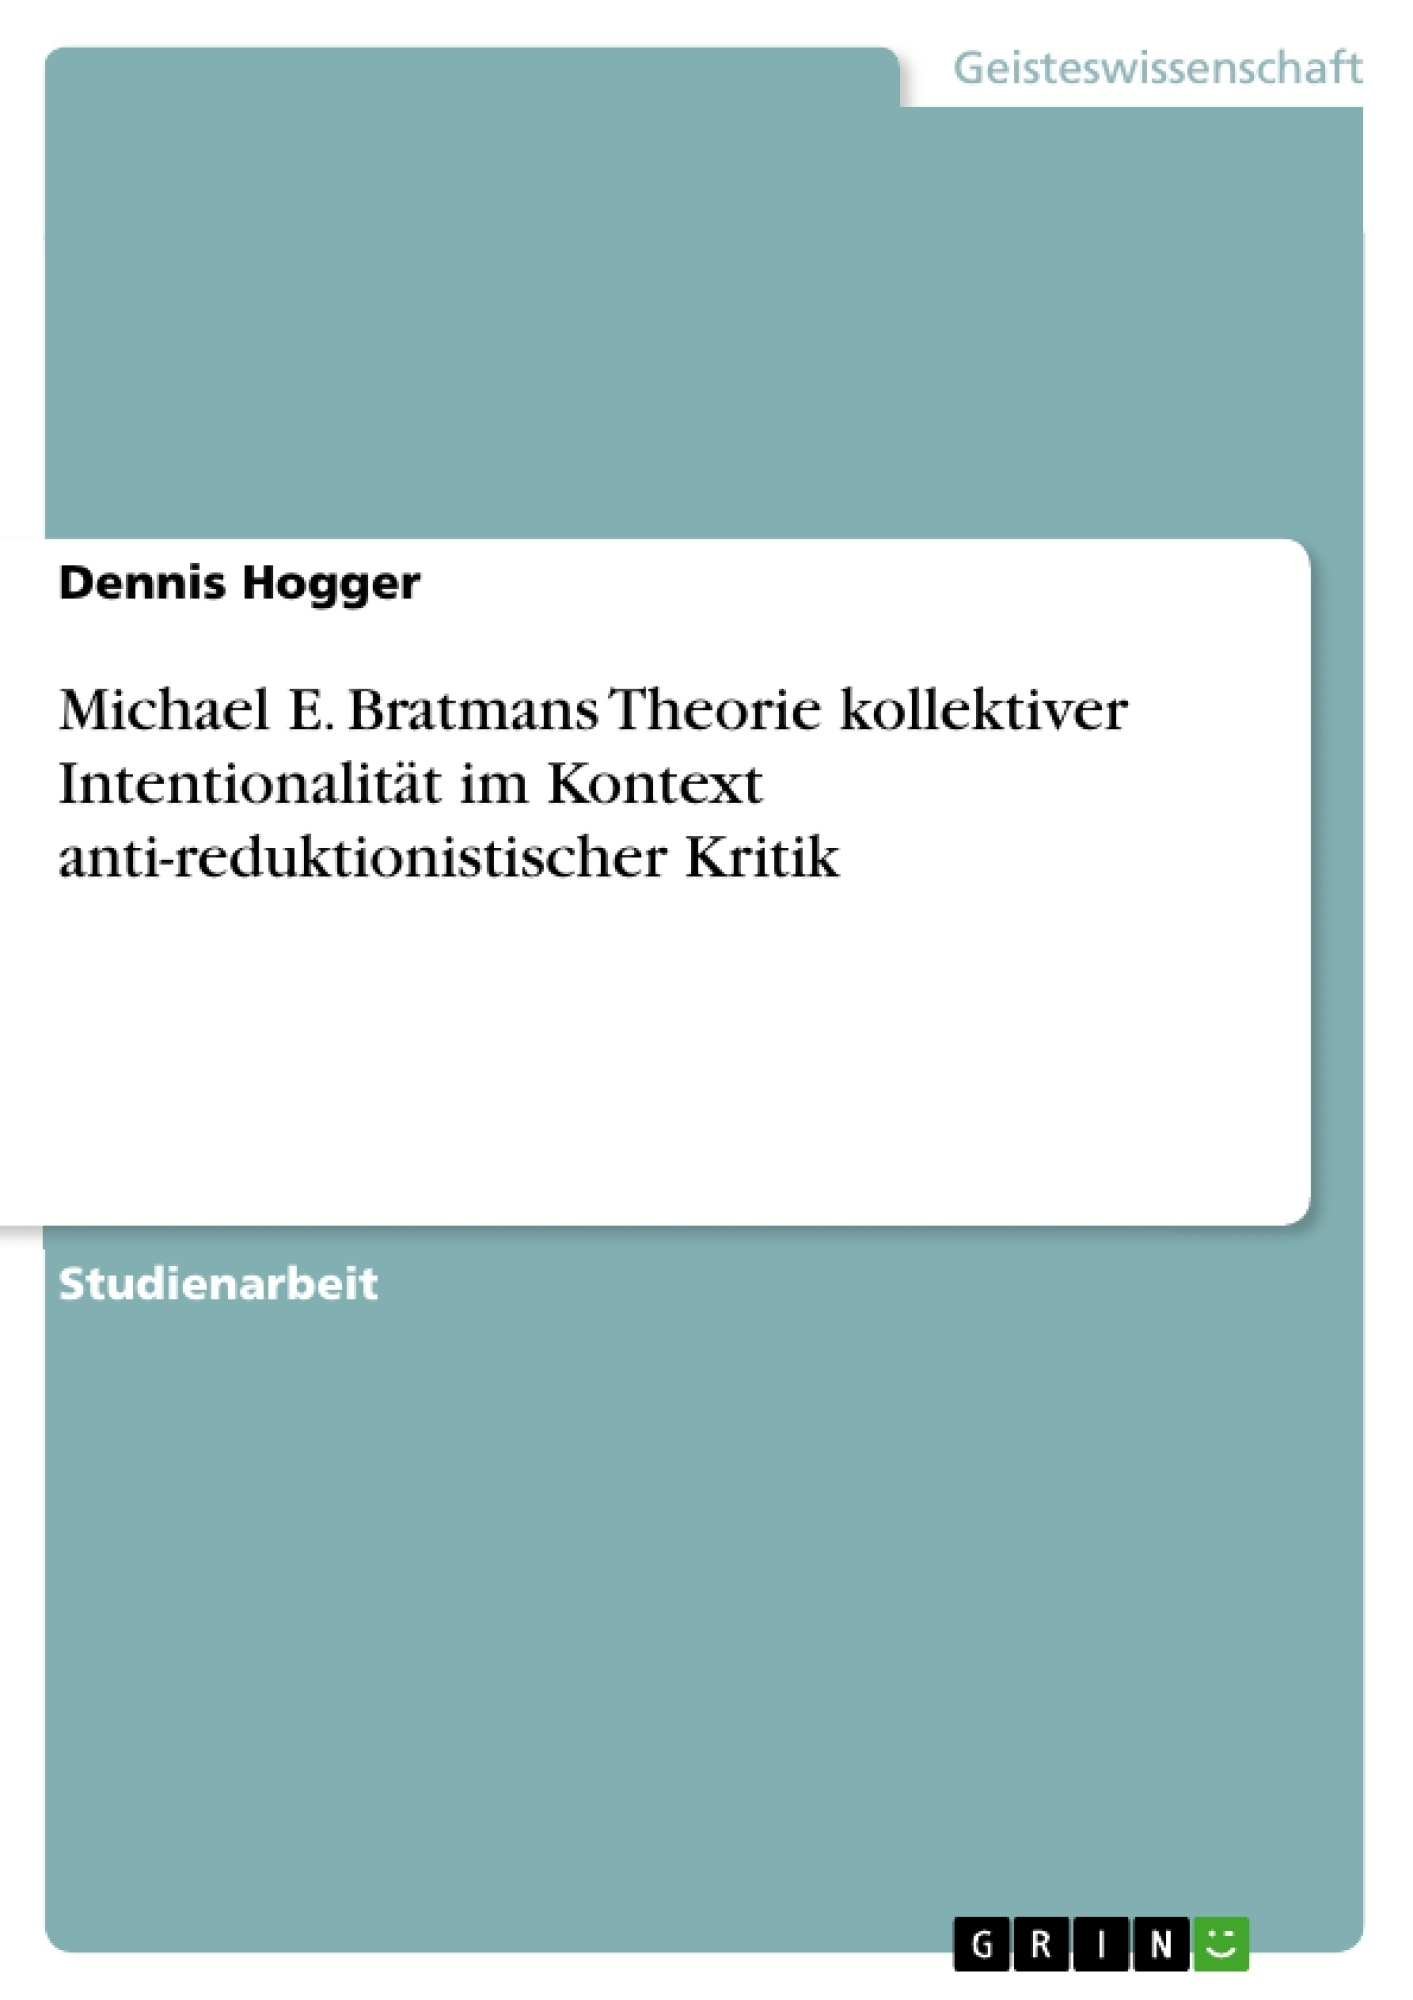 Titel: Michael E. Bratmans Theorie kollektiver Intentionalität im Kontext anti-reduktionistischer Kritik